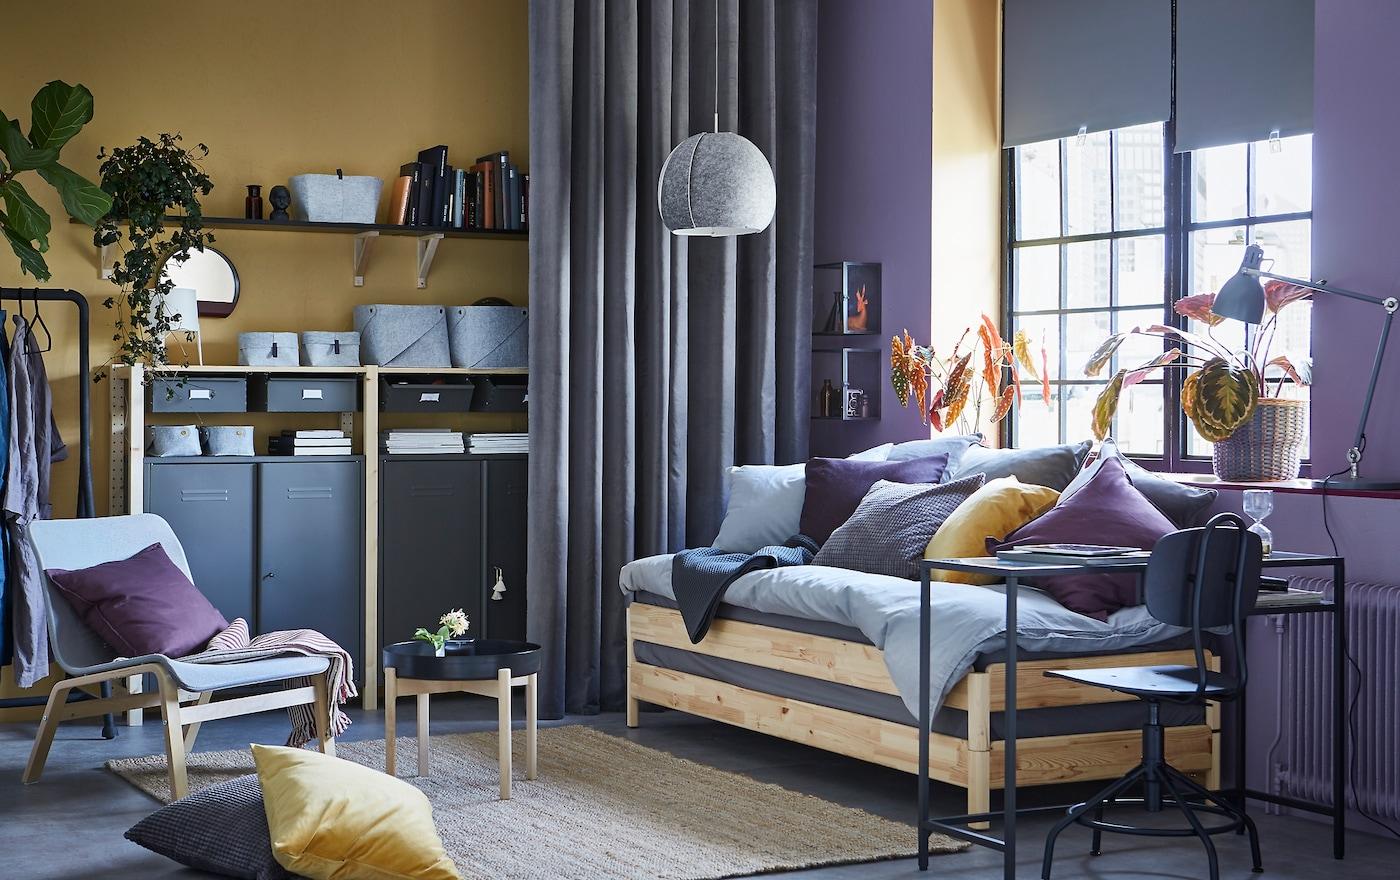 Woonkamer Ideeen Paars.Bedroom Inspiration Ikea